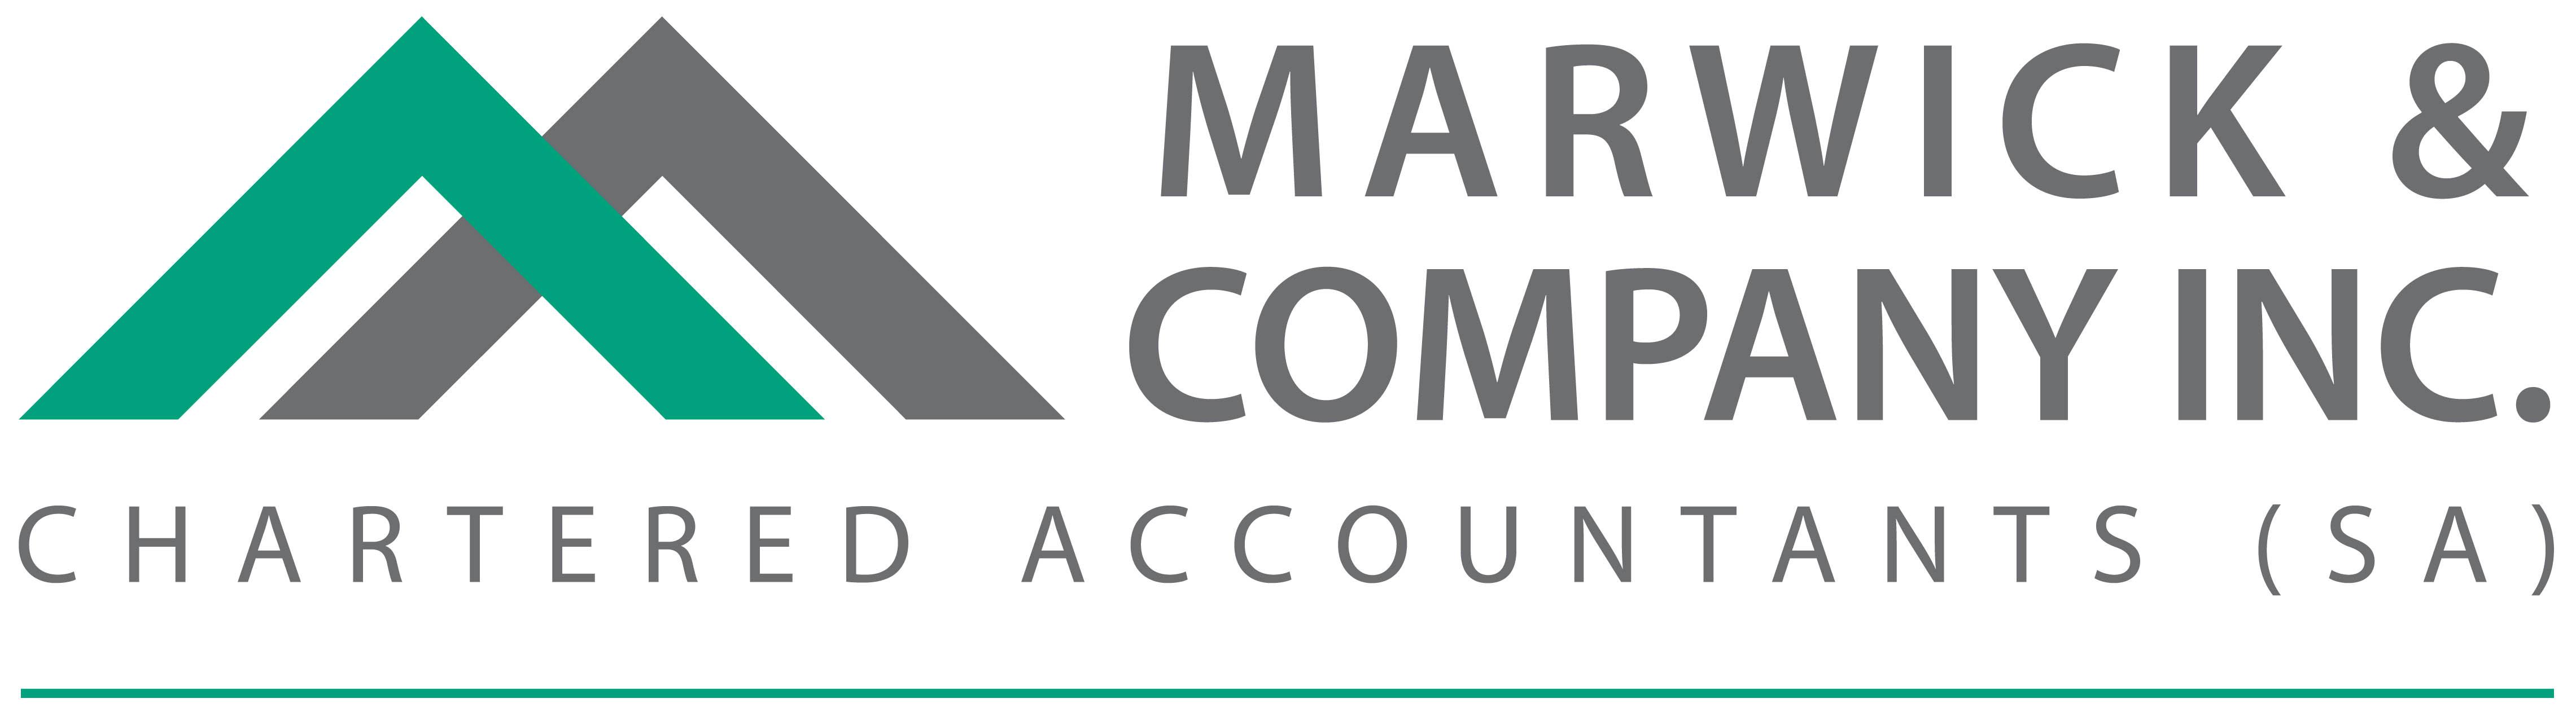 Marwick & Company Inc.